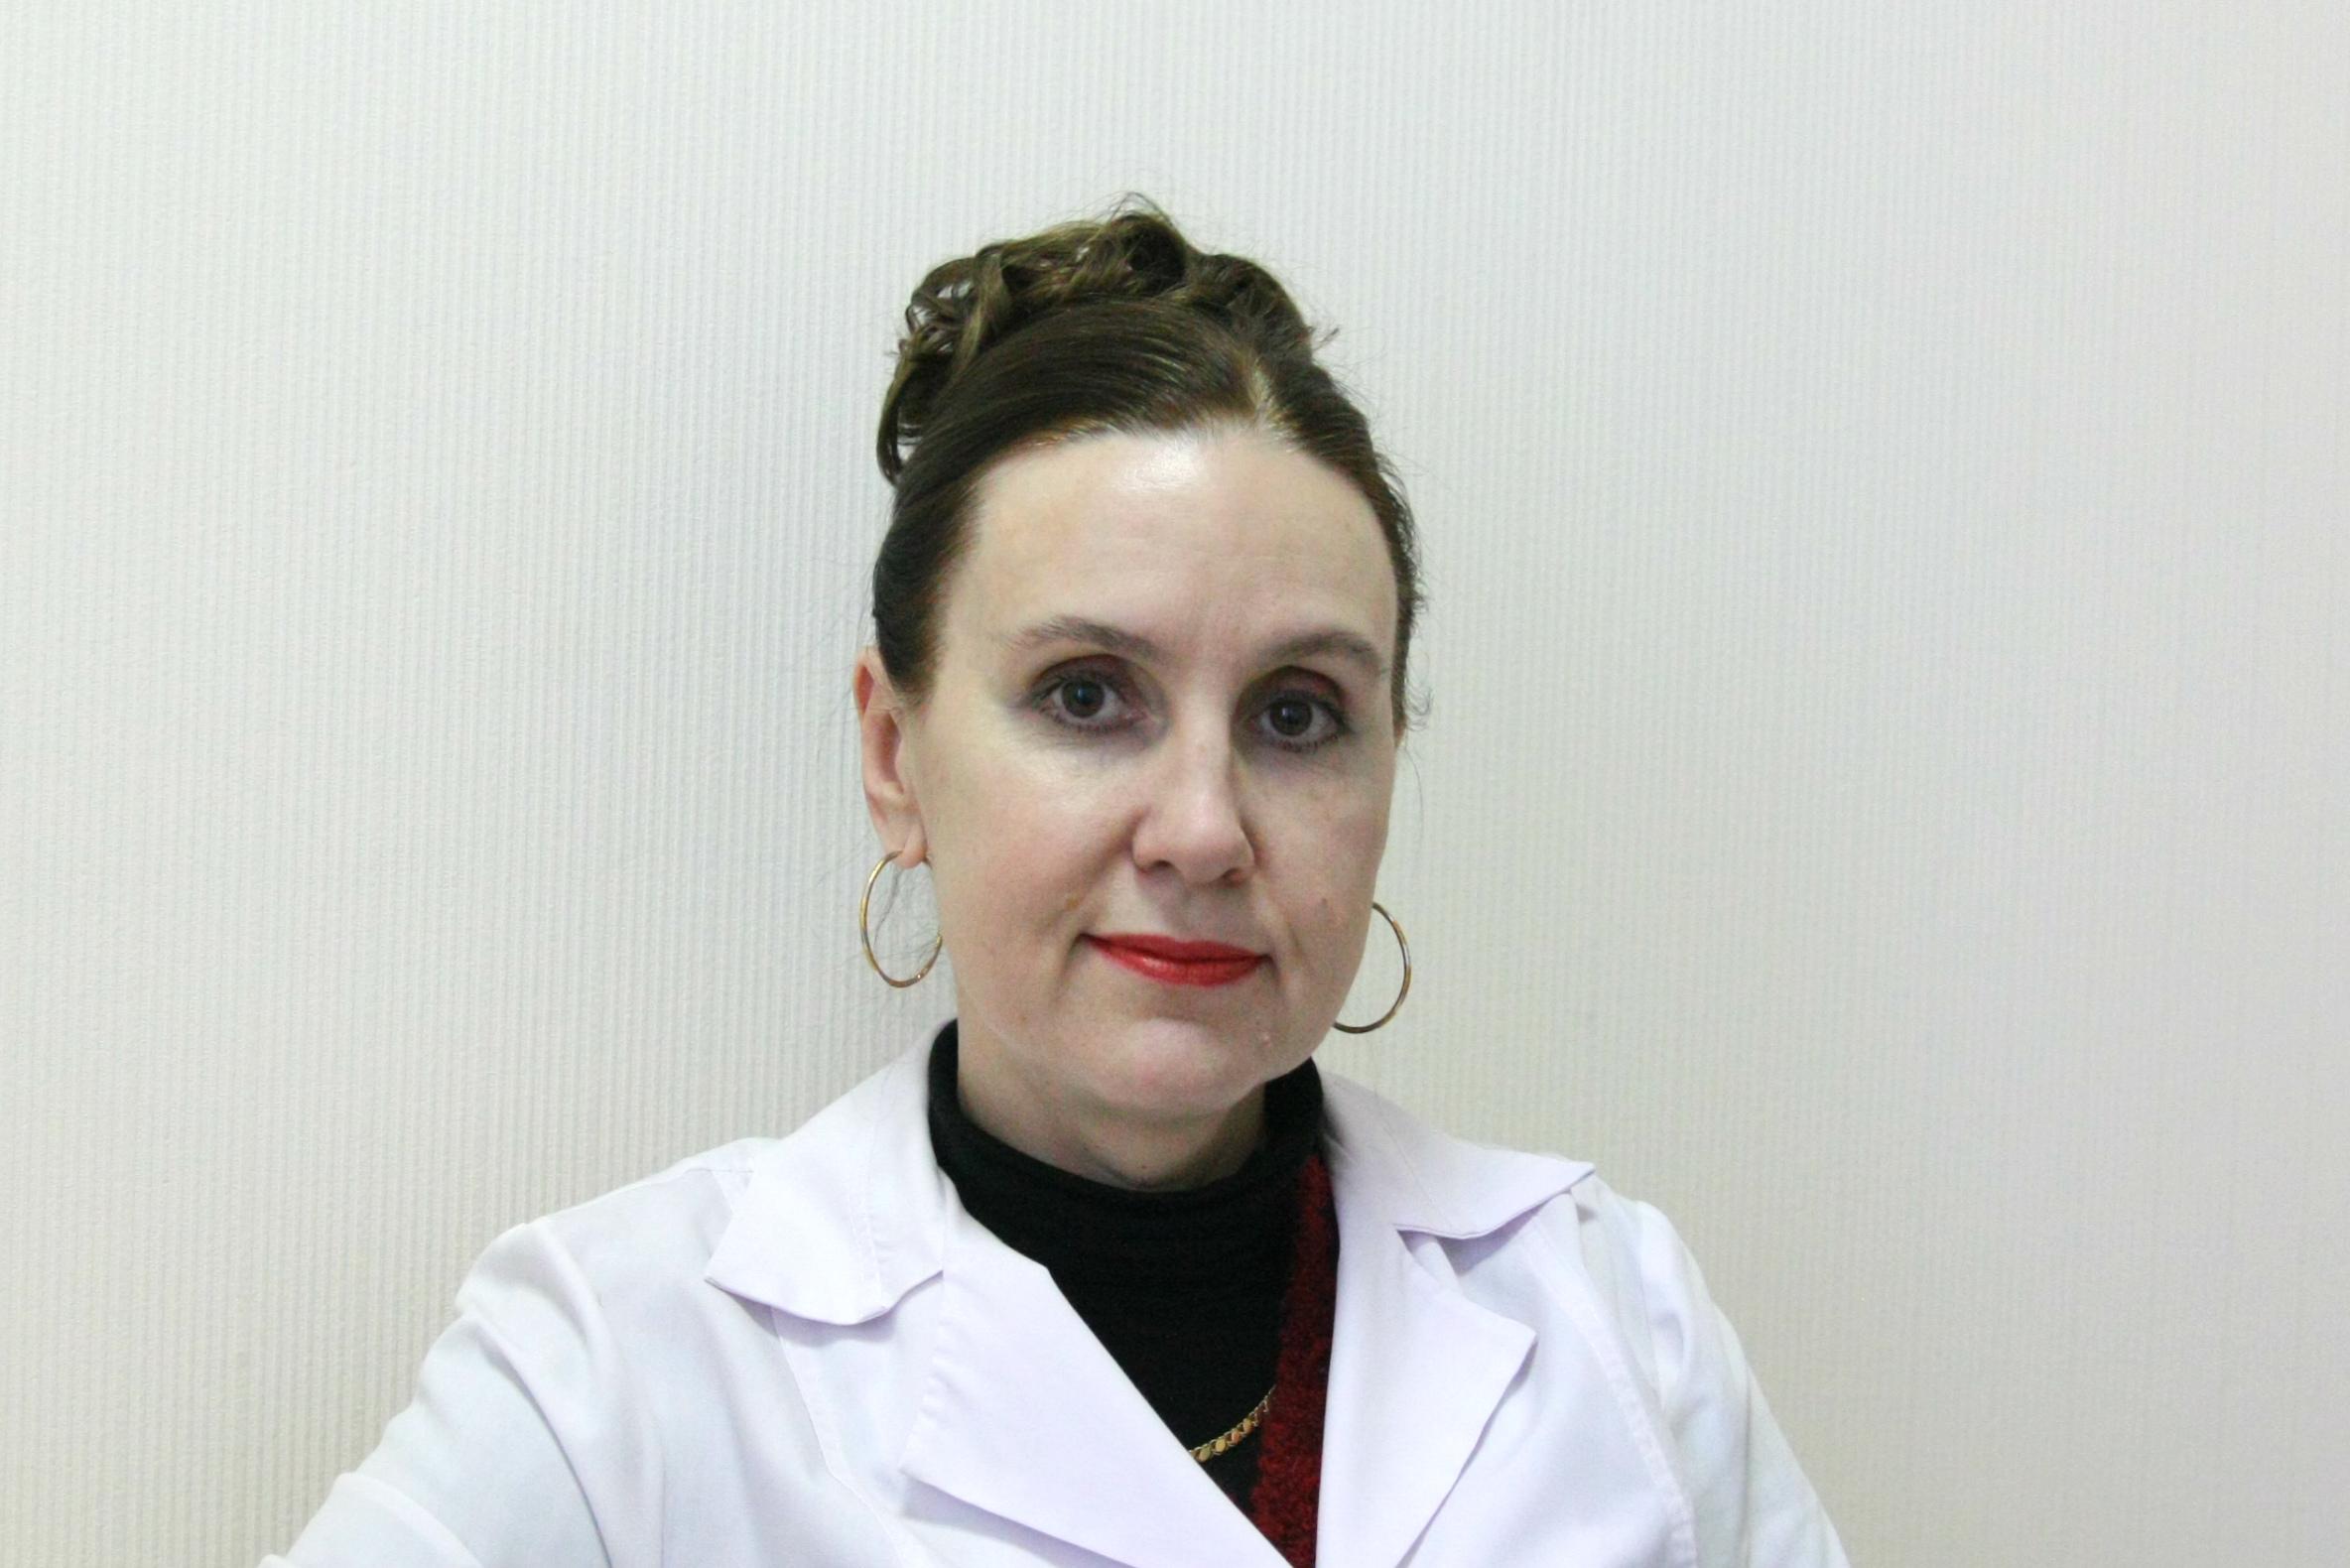 Вихрева Евгения Владимировна